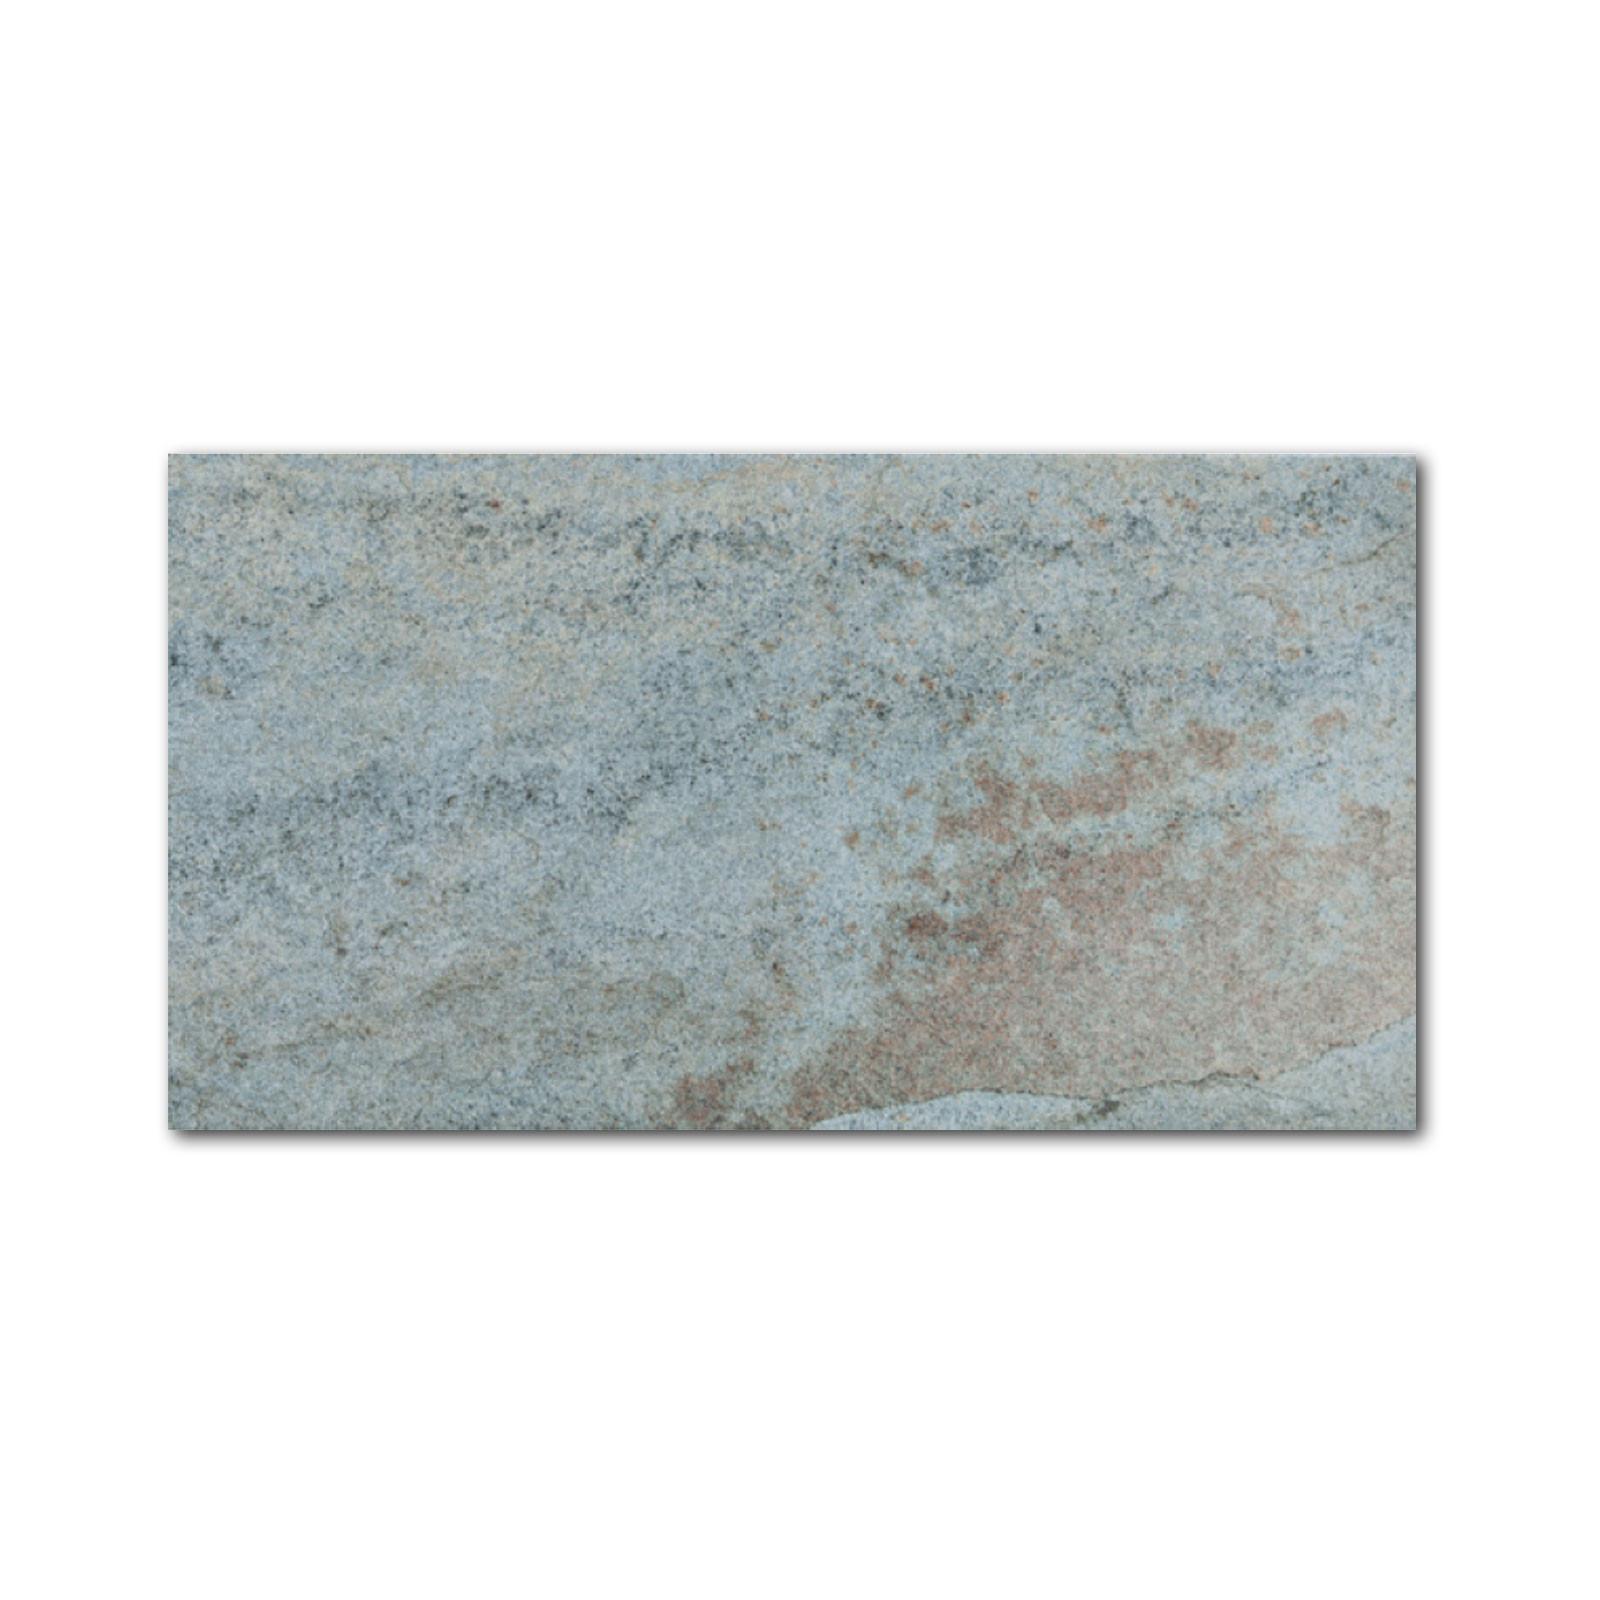 Cuarcita Musgo Wall Tile